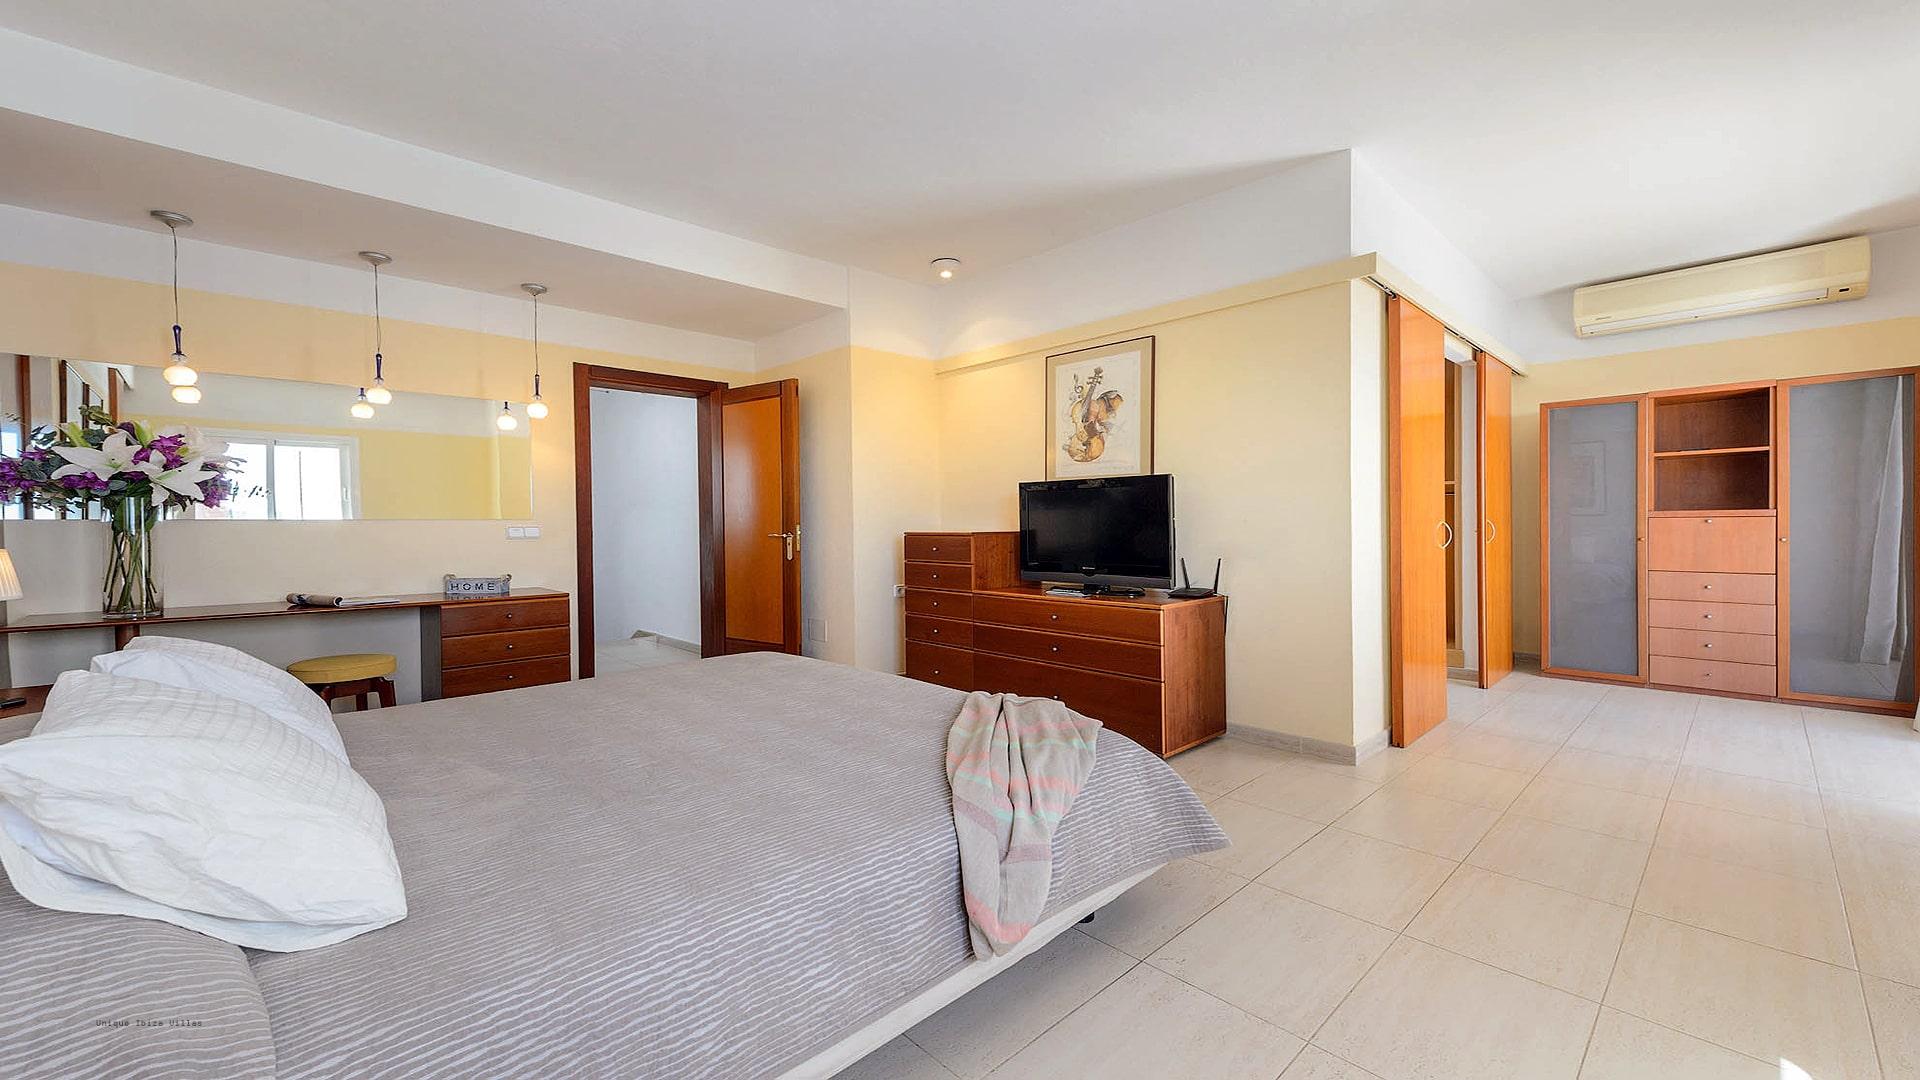 Villa Can Fluxa Ibiza 33 Bedroom 1